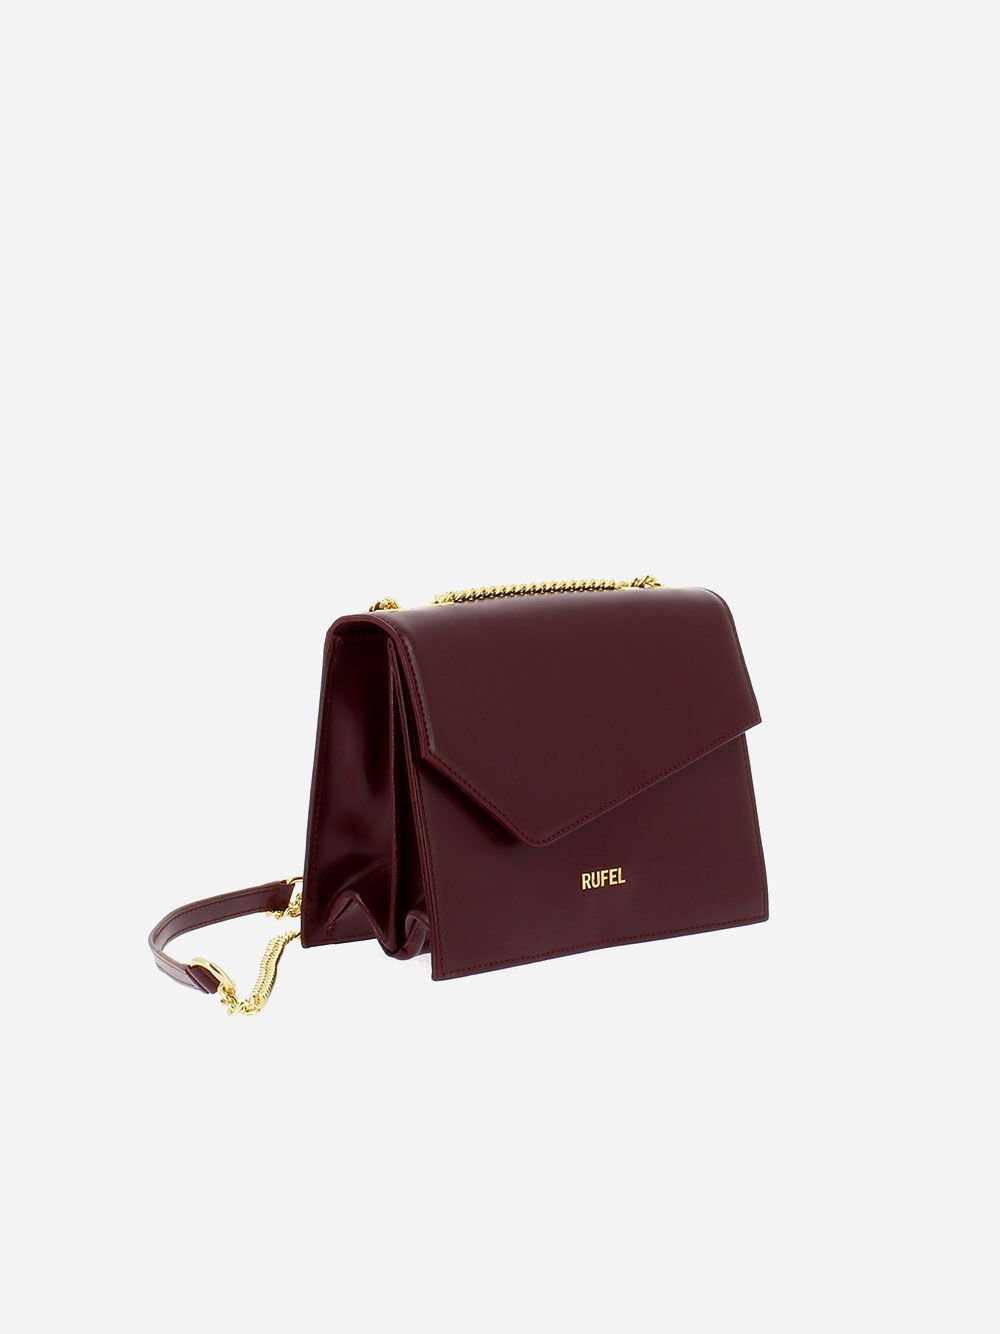 Soave Burgundy Crossbody Bag   Rufel